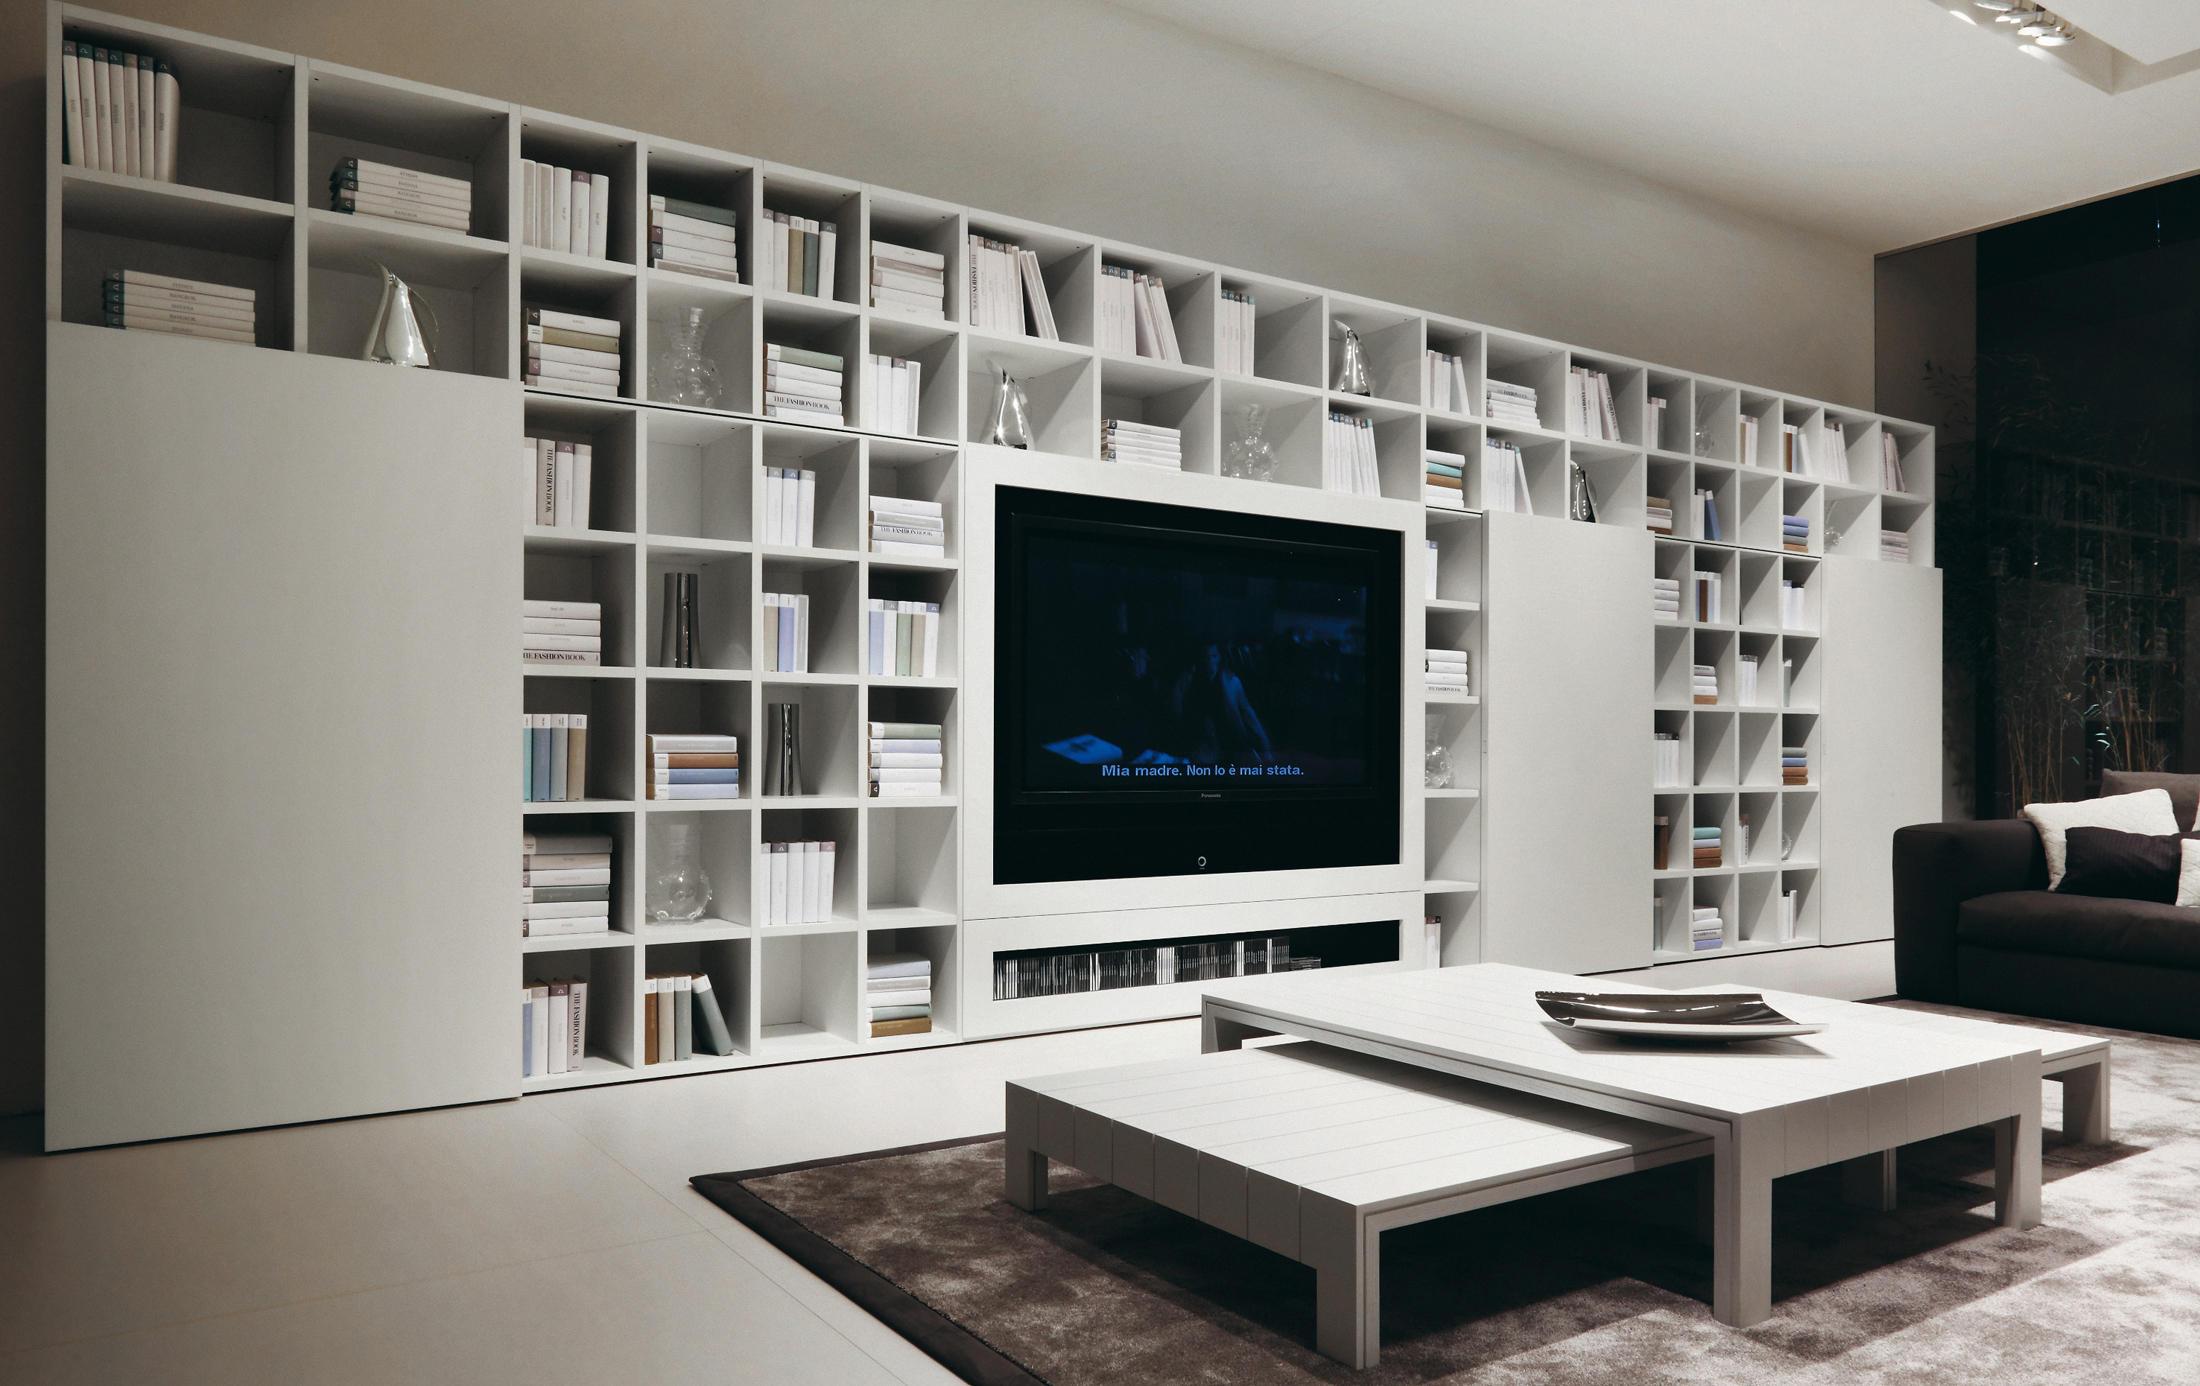 Mobili Soggiorno Feg : Frame modular system pareti attrezzate feg architonic